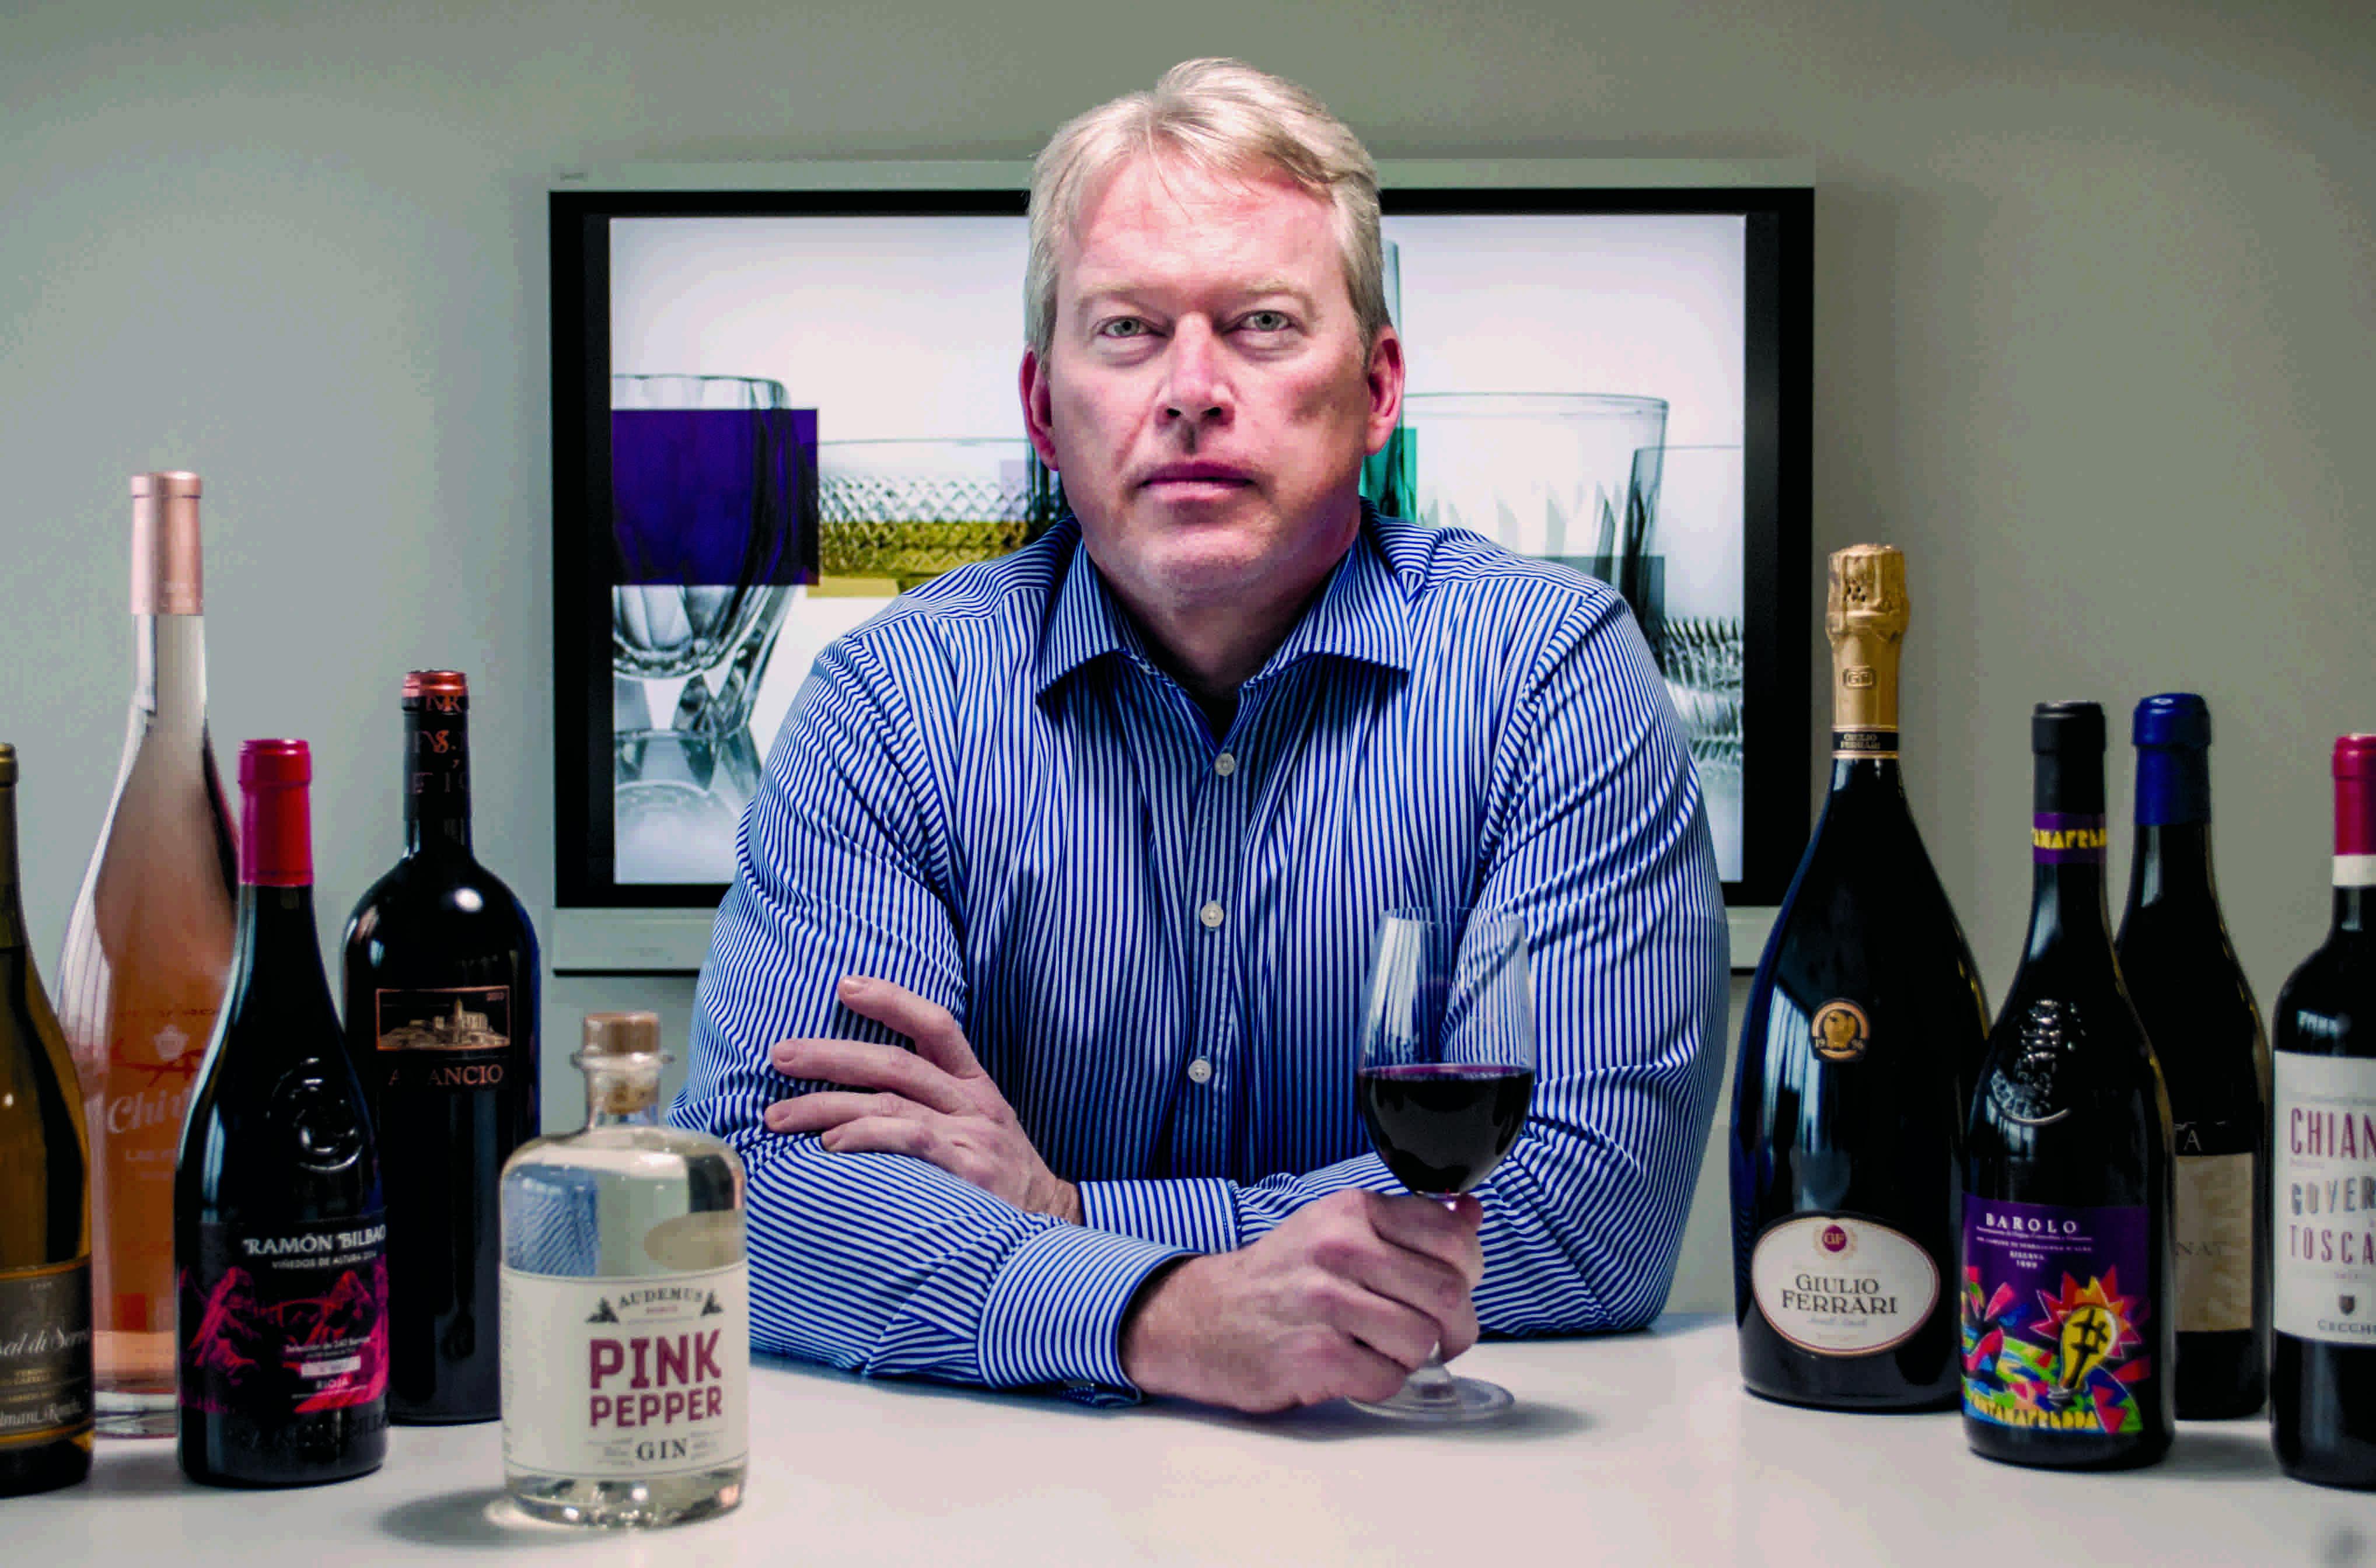 7023084aa6a Top 50 Drinks Wholesalers - Harpers Wine   Spirit Trade News